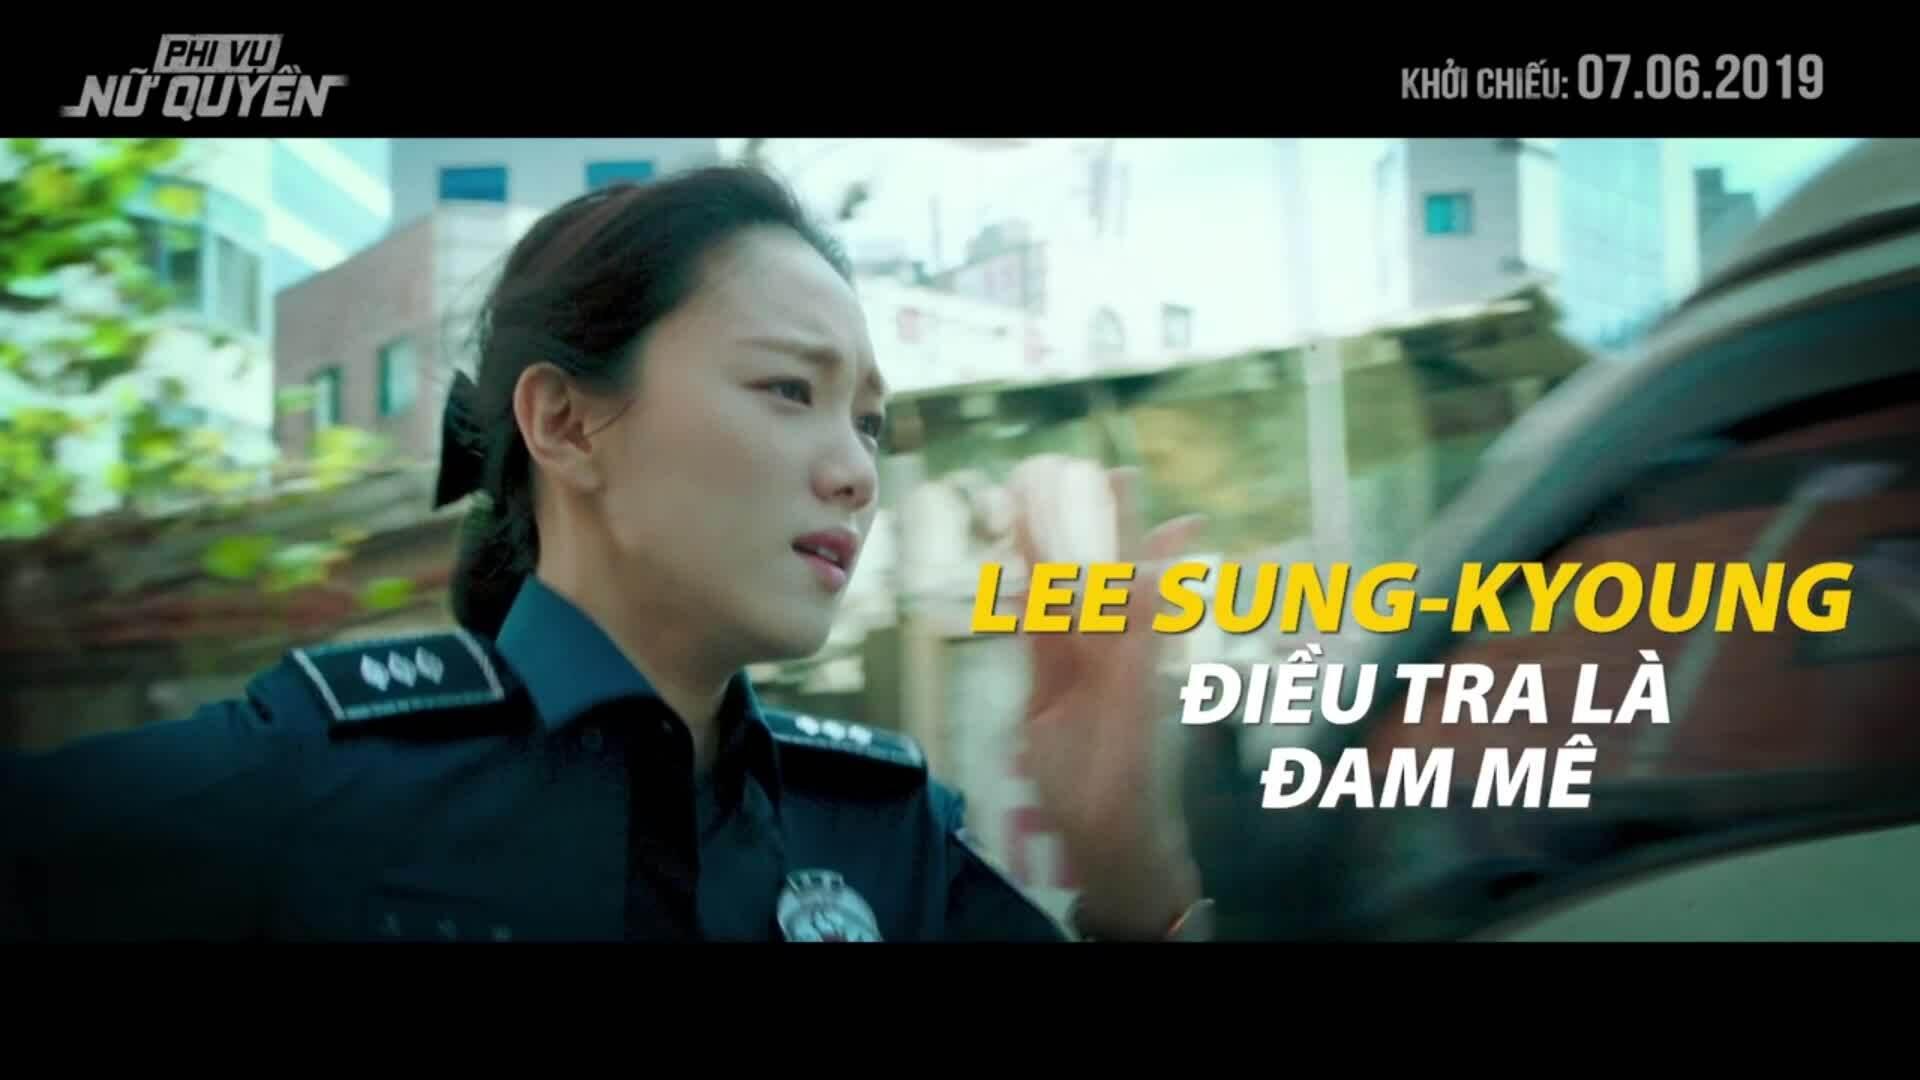 Miss & Mrs. Cops (Phi vụ nữ quyền)